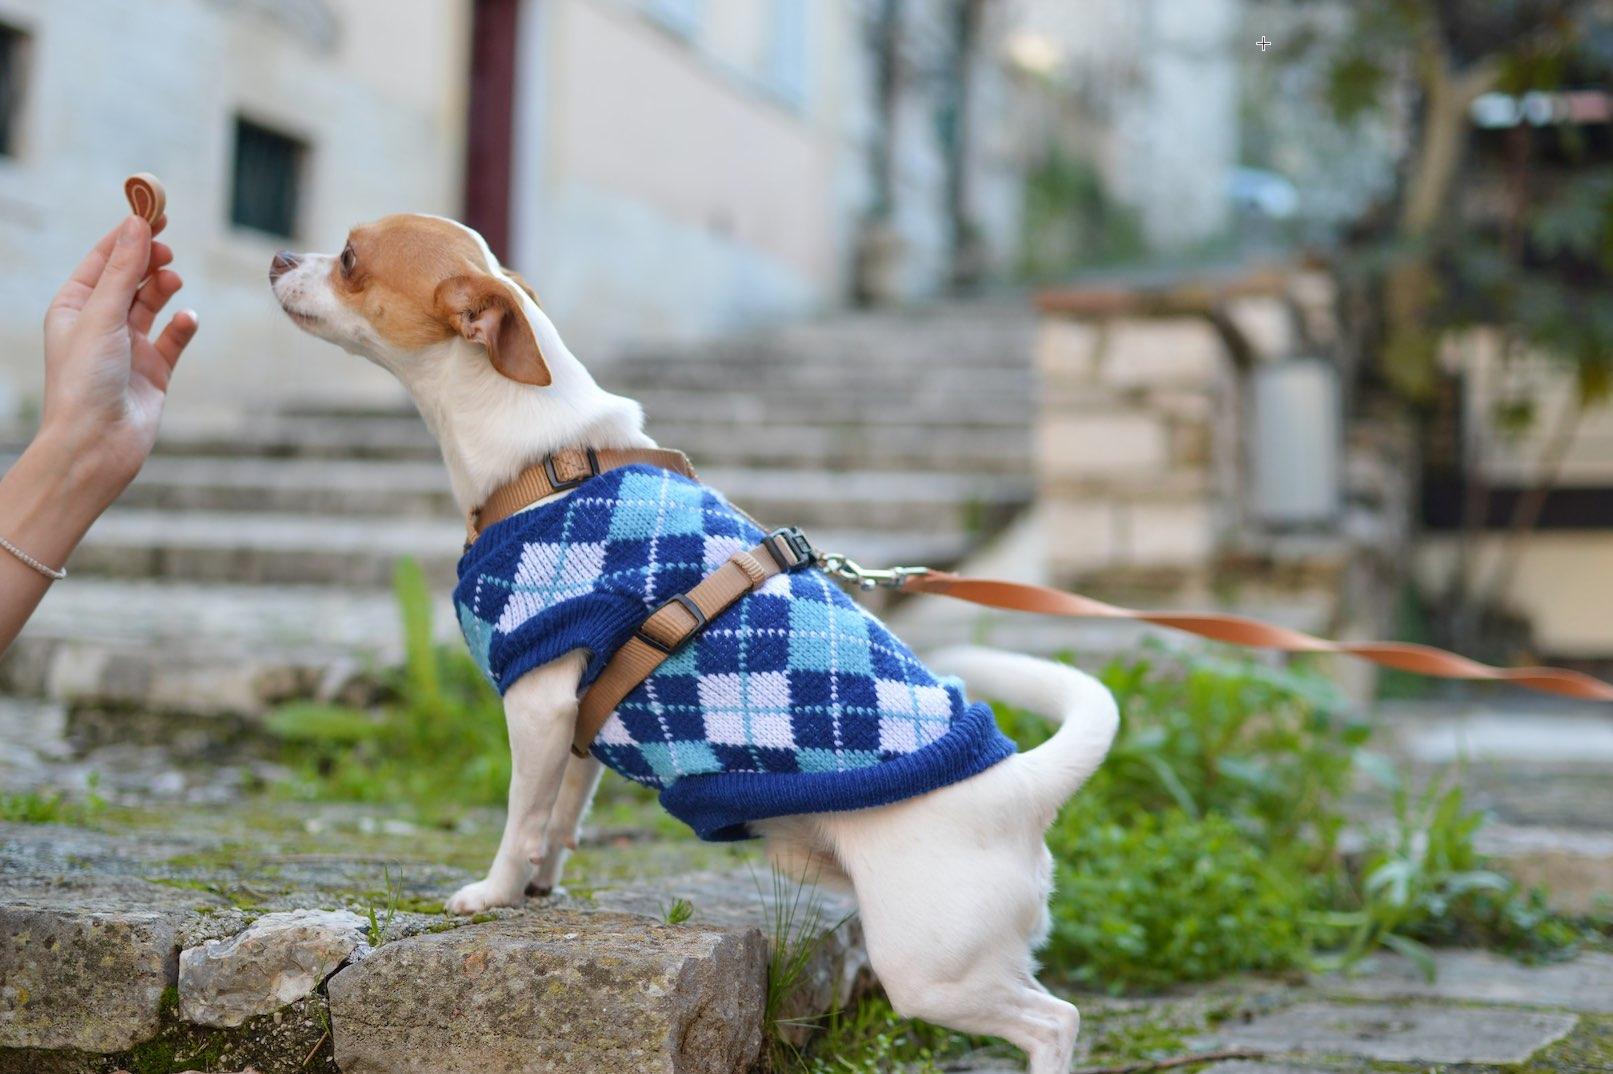 Jinx Launches Dog Wellness Brand That Sells Premium Dog Foods Online